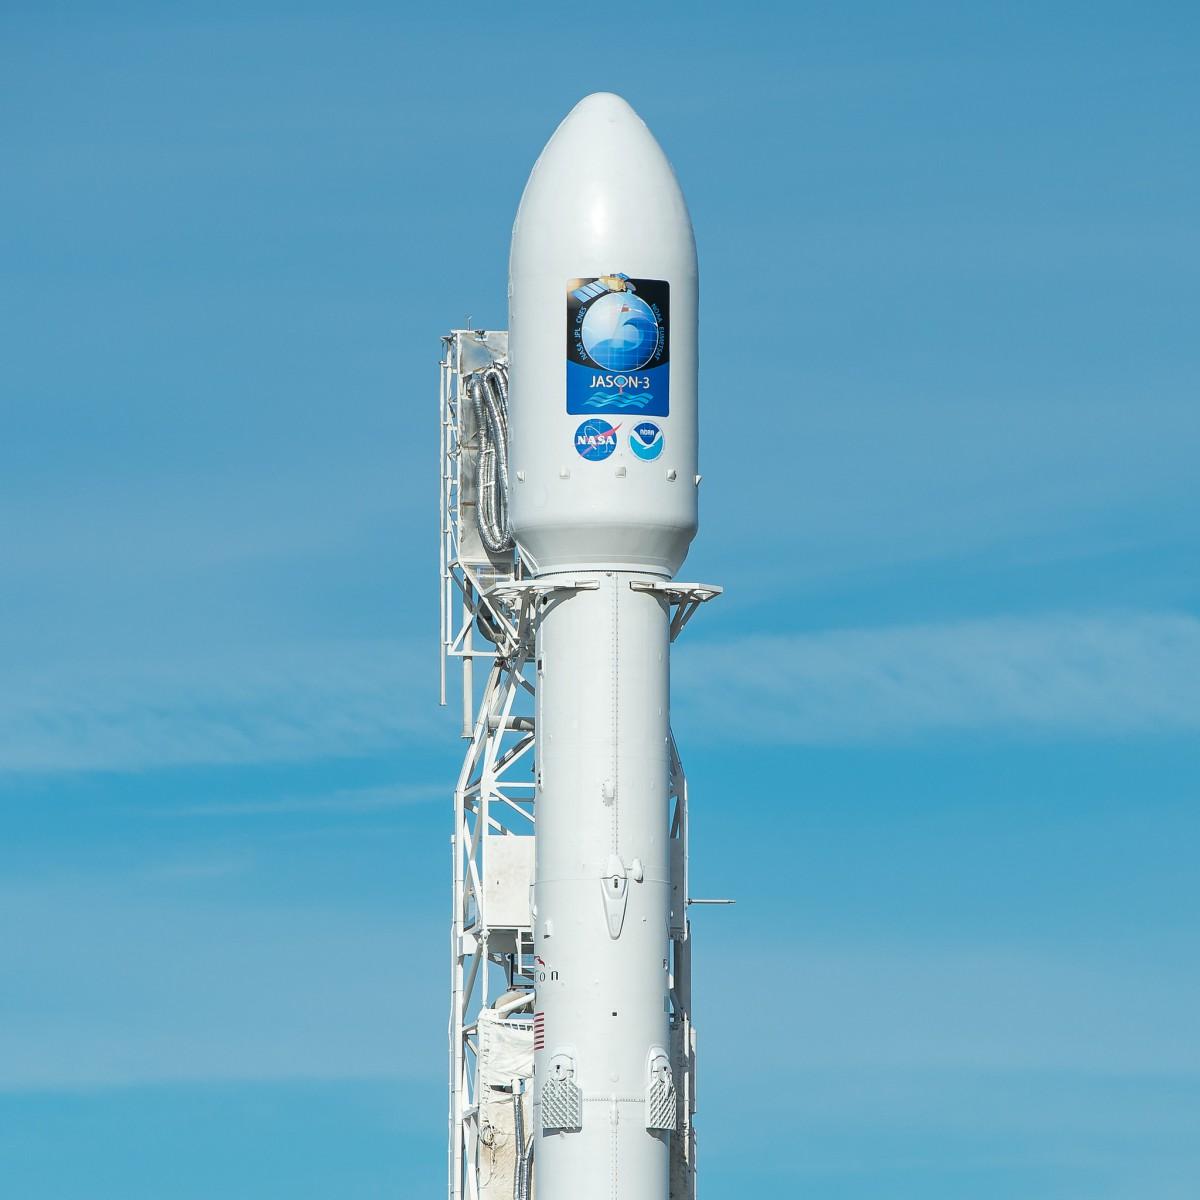 fort spacexs jason 3 satellite - HD1024×1024